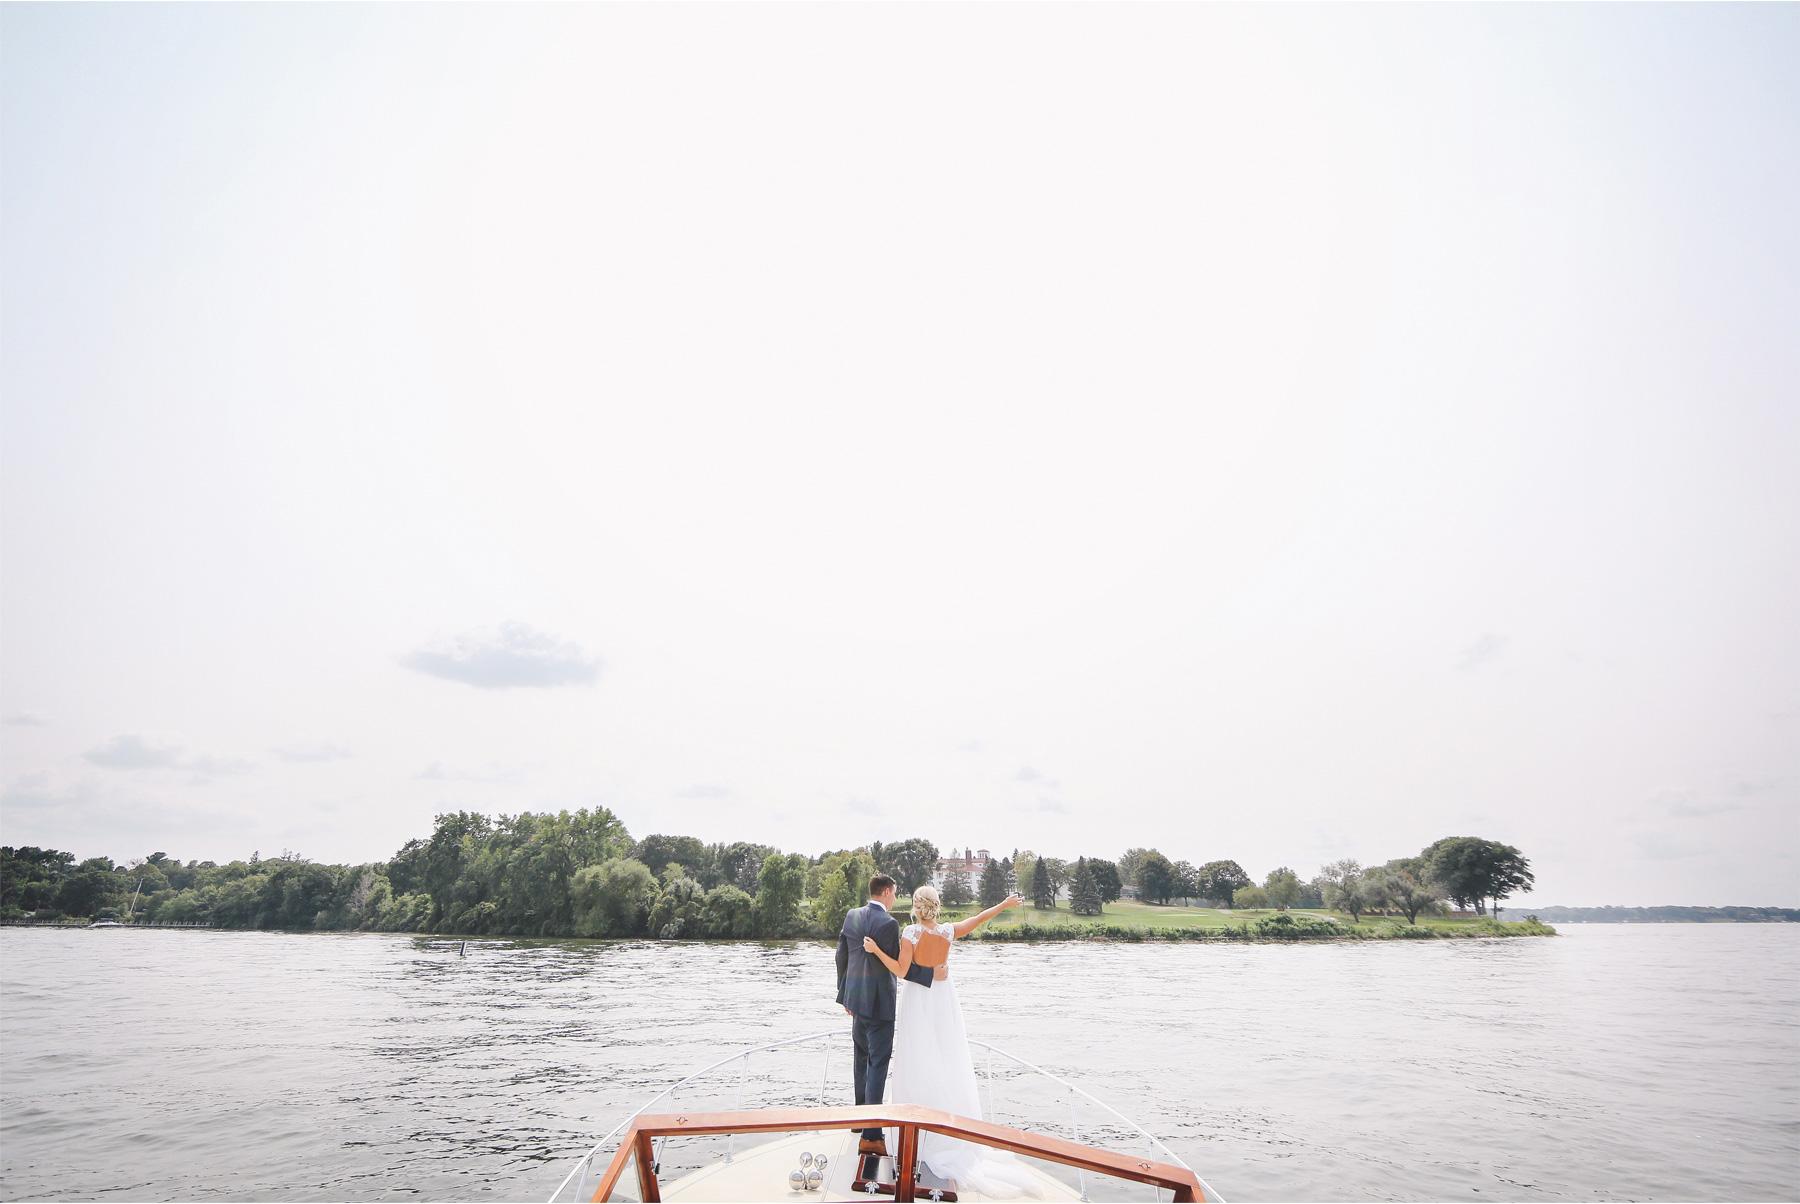 09-Minnetonka-Minnesota-Wedding-Photography-by-Vick-Photography-Boat-Lake-Minnetonka-First-Meeting-Jennifer-and-Adam.jpg